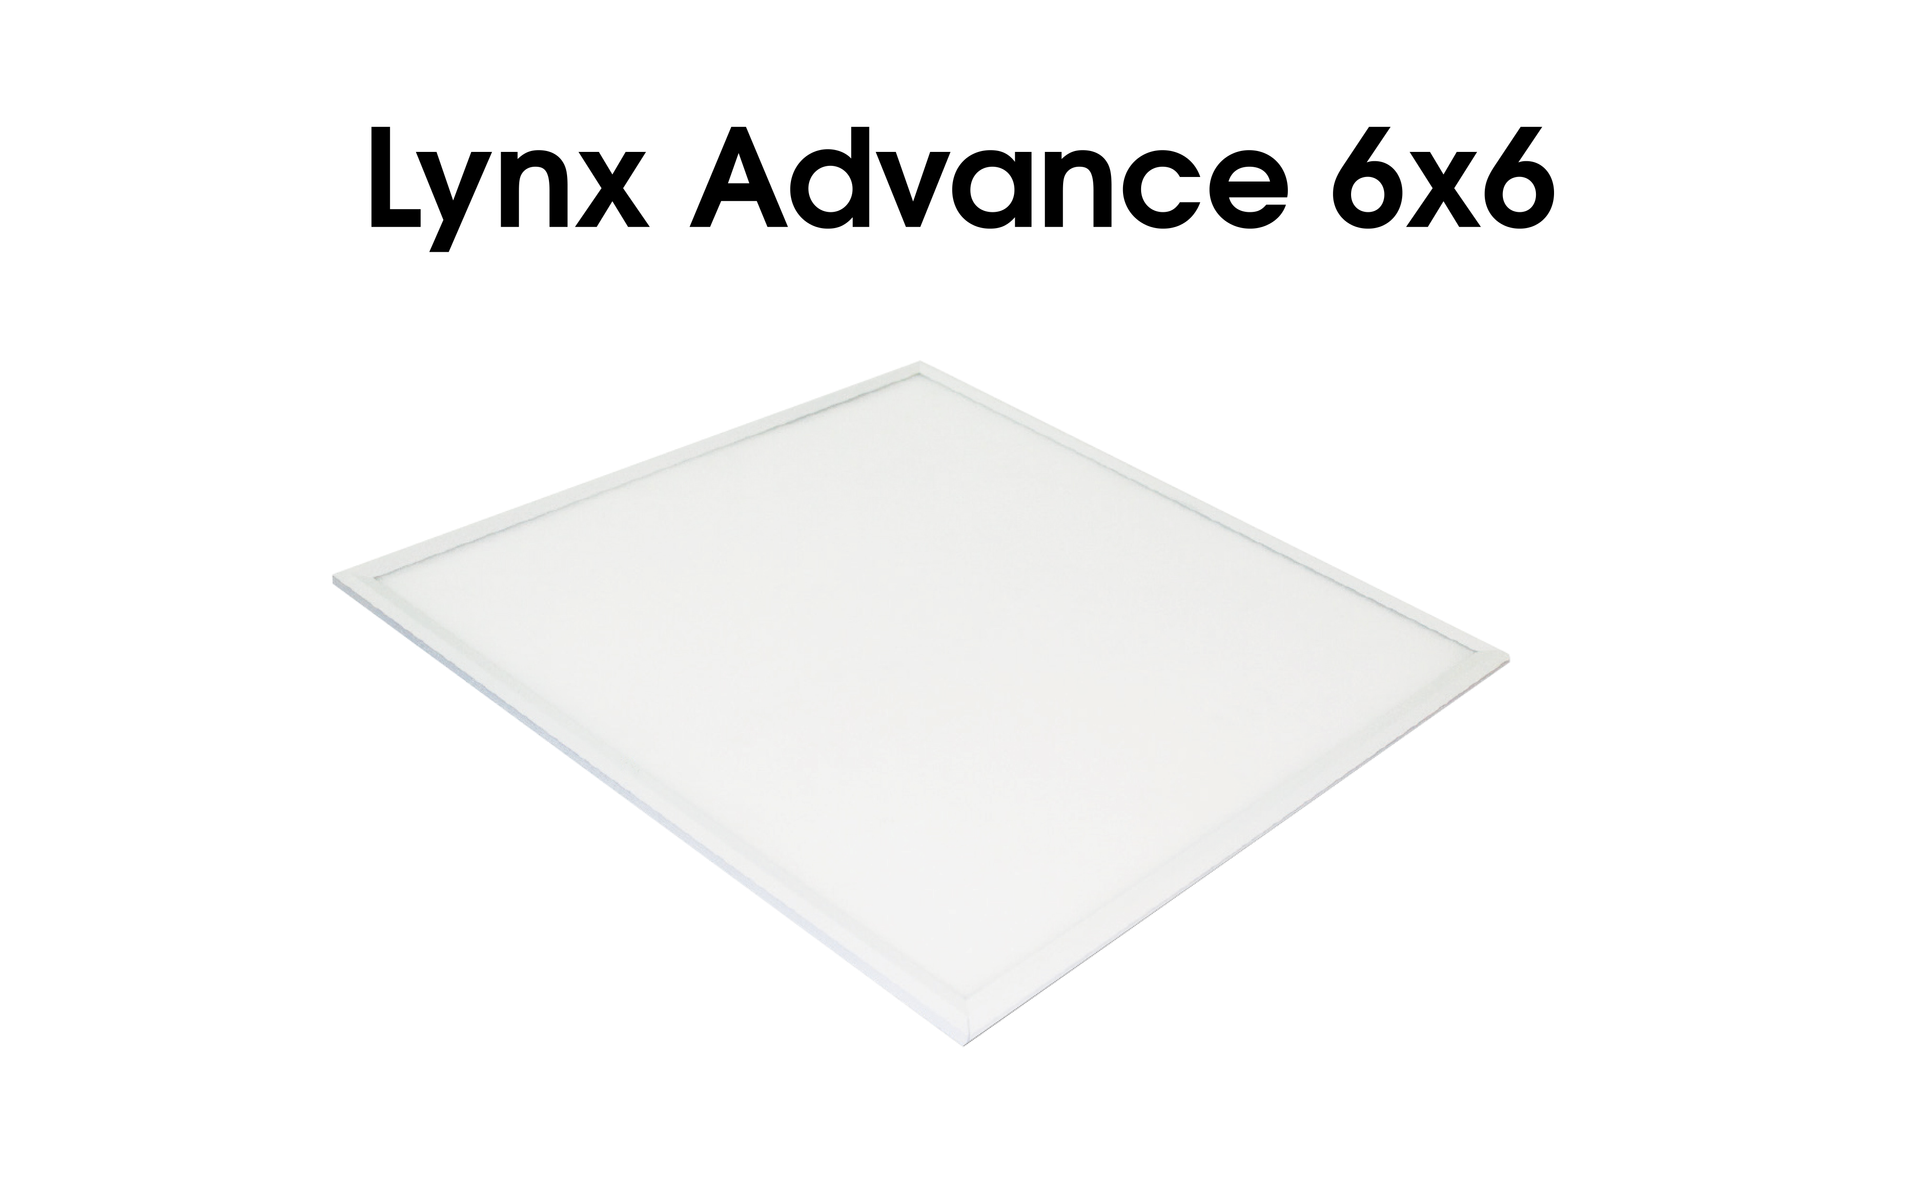 Lynx Adv 6x6 Mobile-01.png